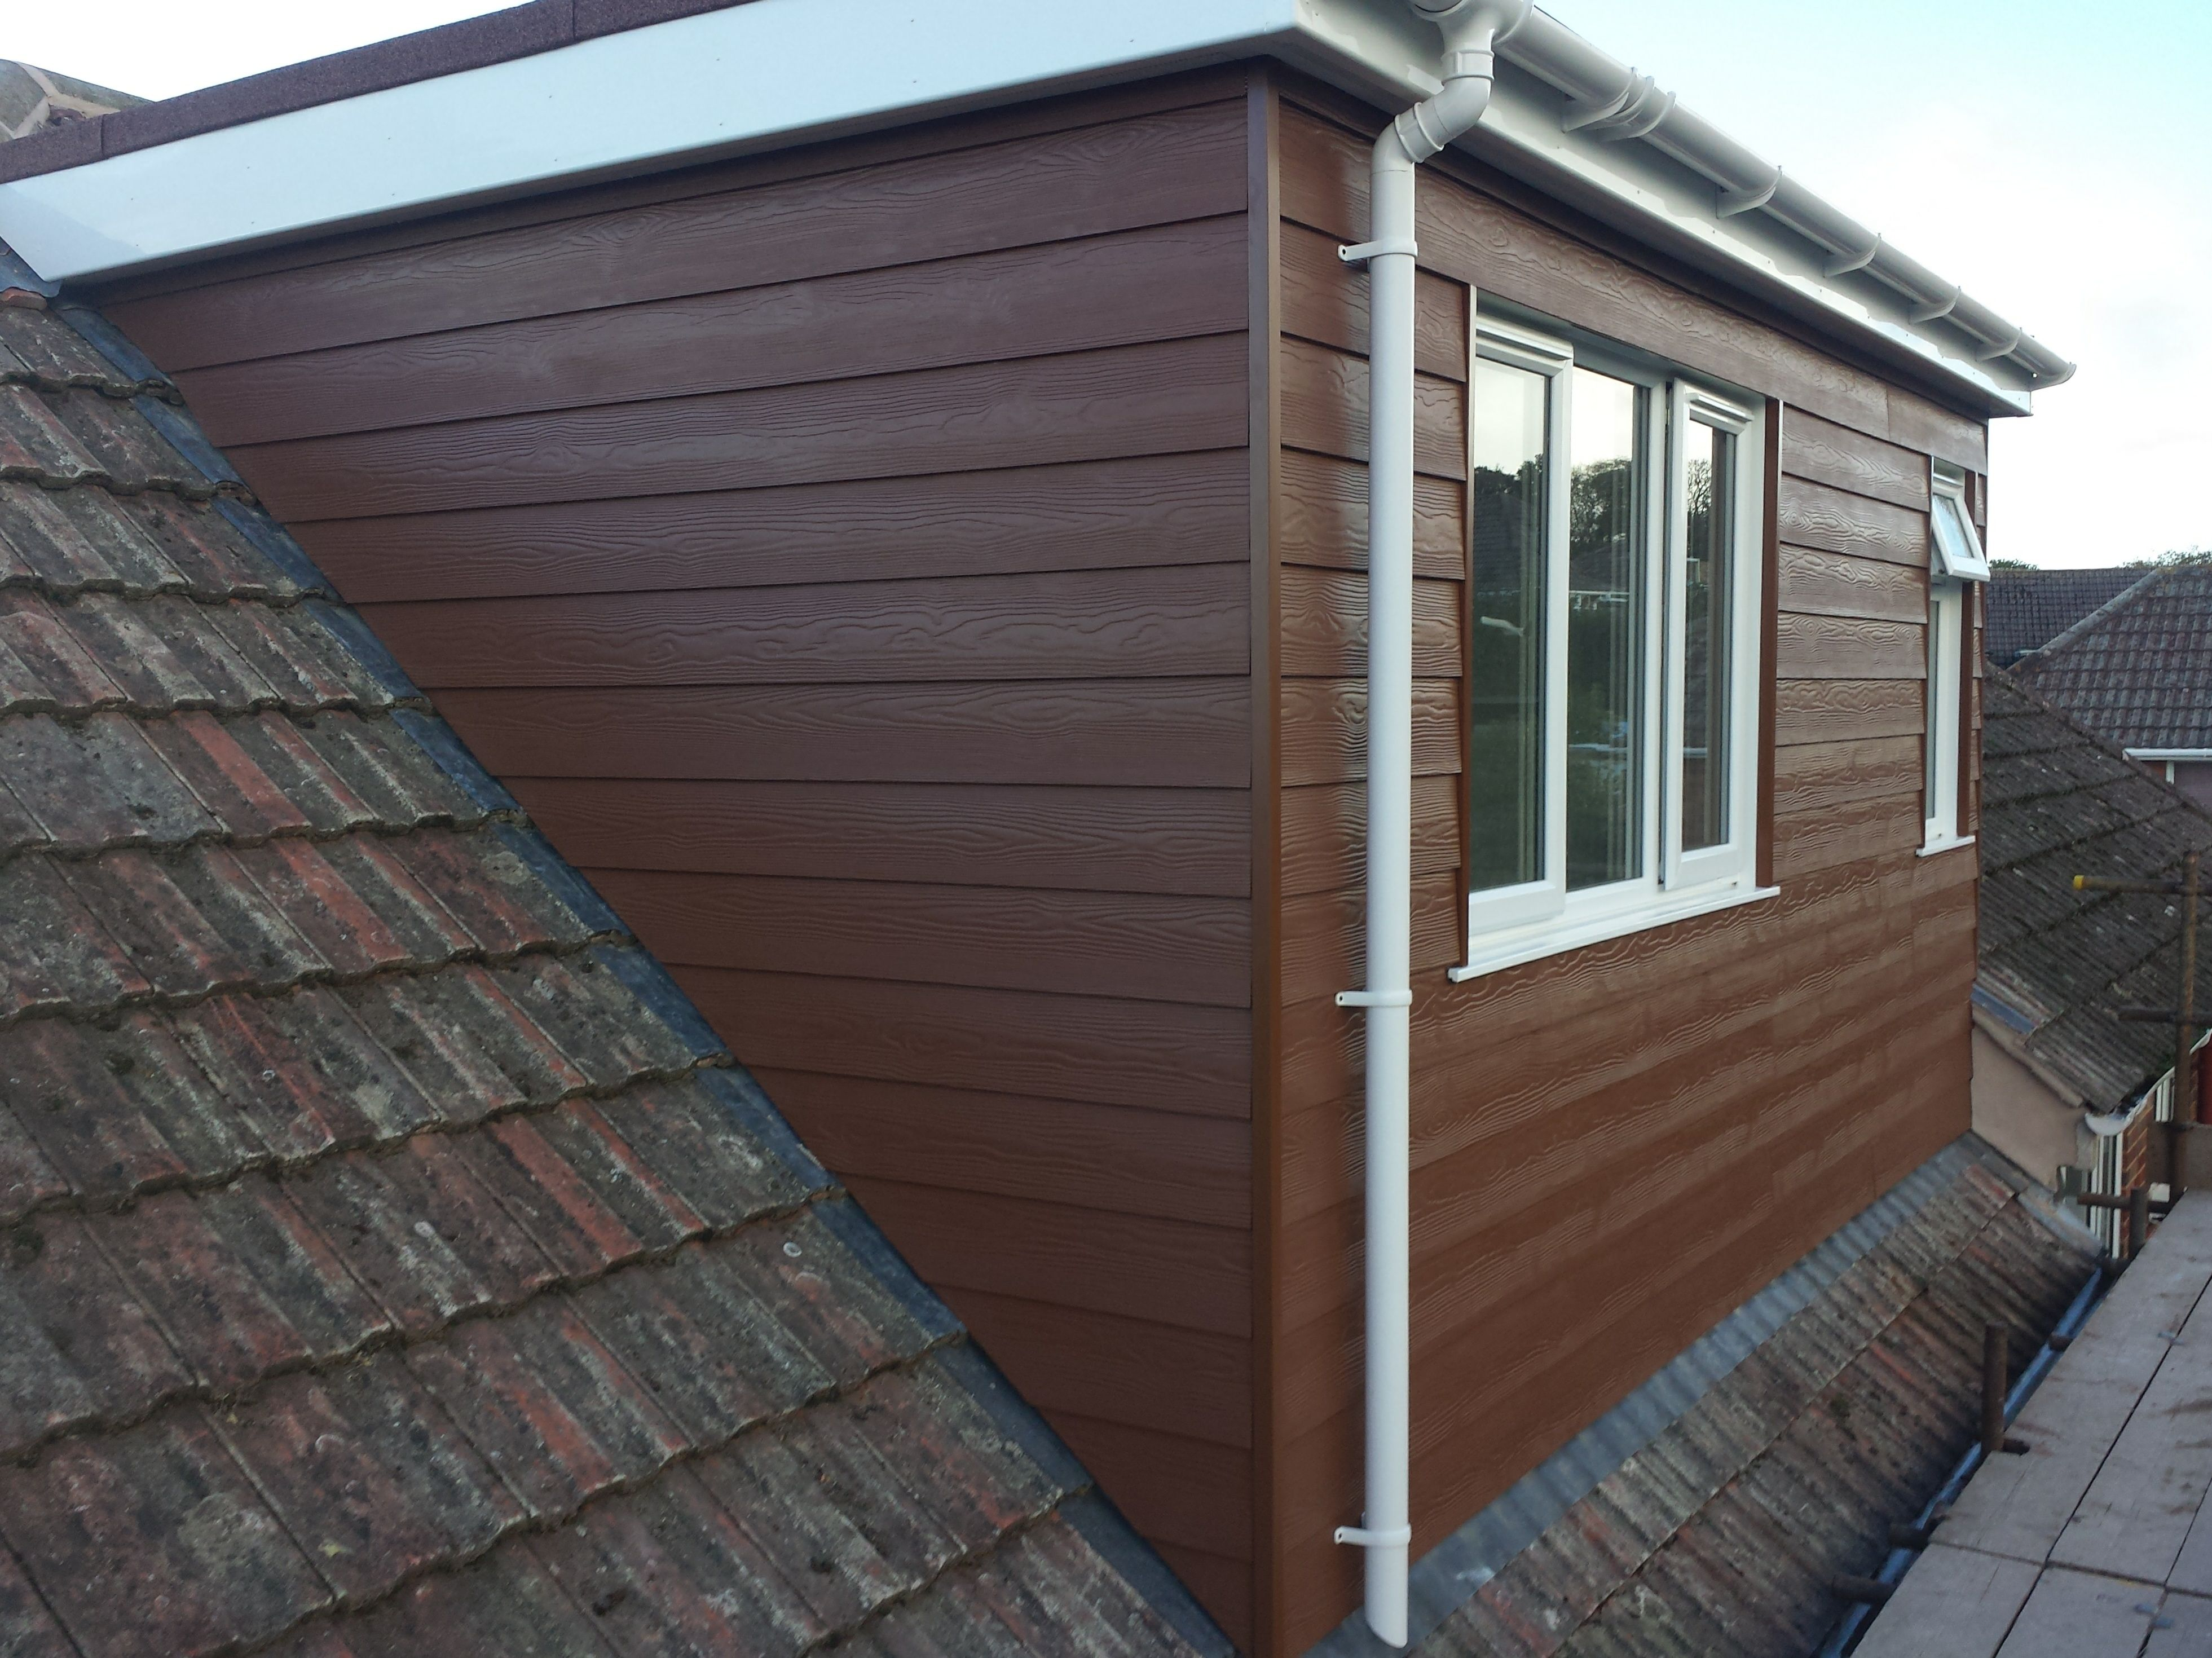 Cedral Weather Boarding 5 Jpg 3922 2940 Flat Roof Cedral Weatherboard Dormers